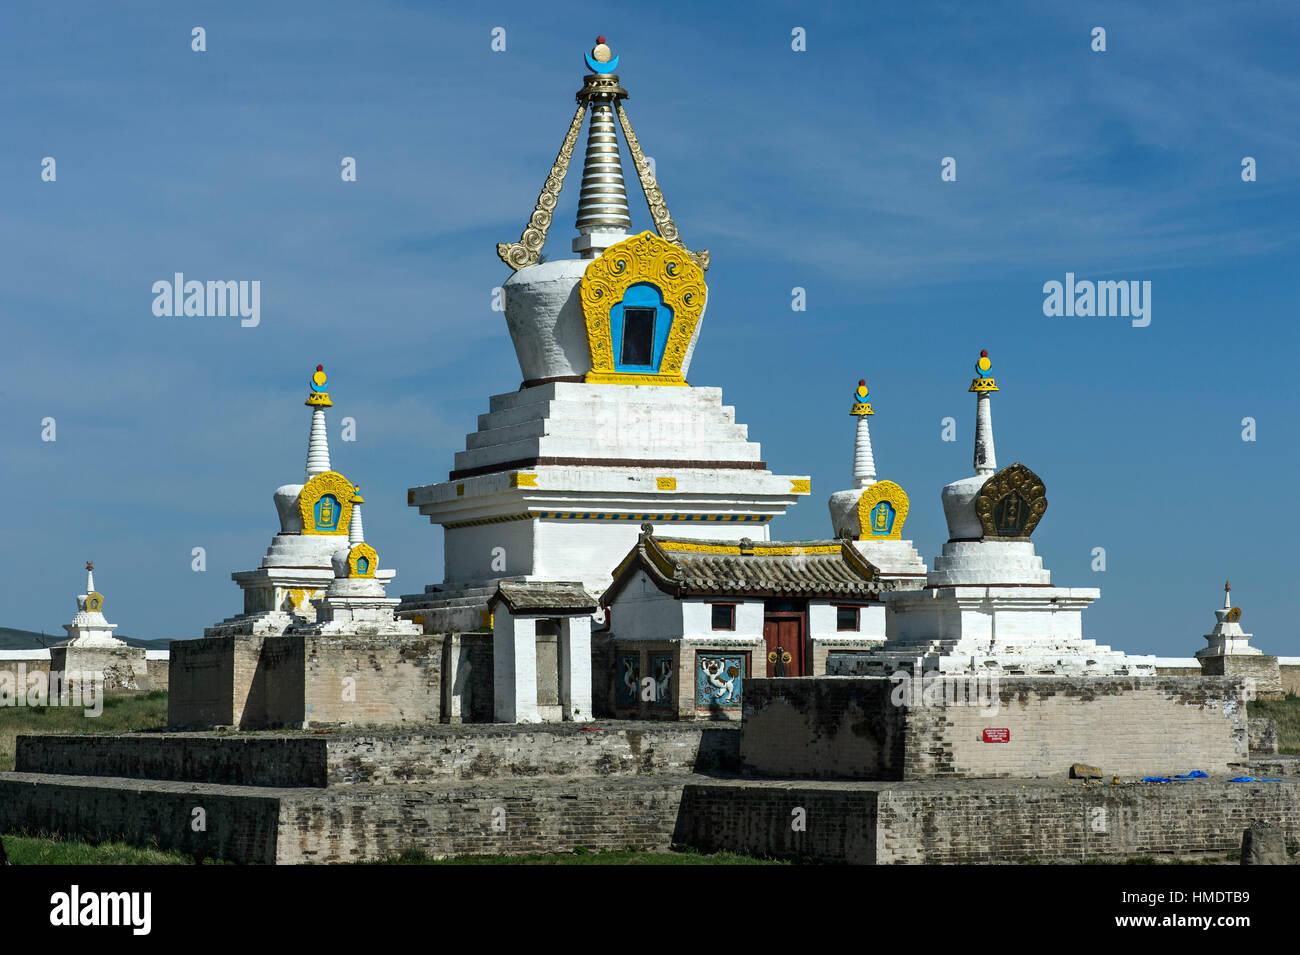 Stupa and temple, Erdene Zuu Khiid monastery, Karakorum, Kharkhorin, Övörkhangai Aimak, Mongolia - Stock Image